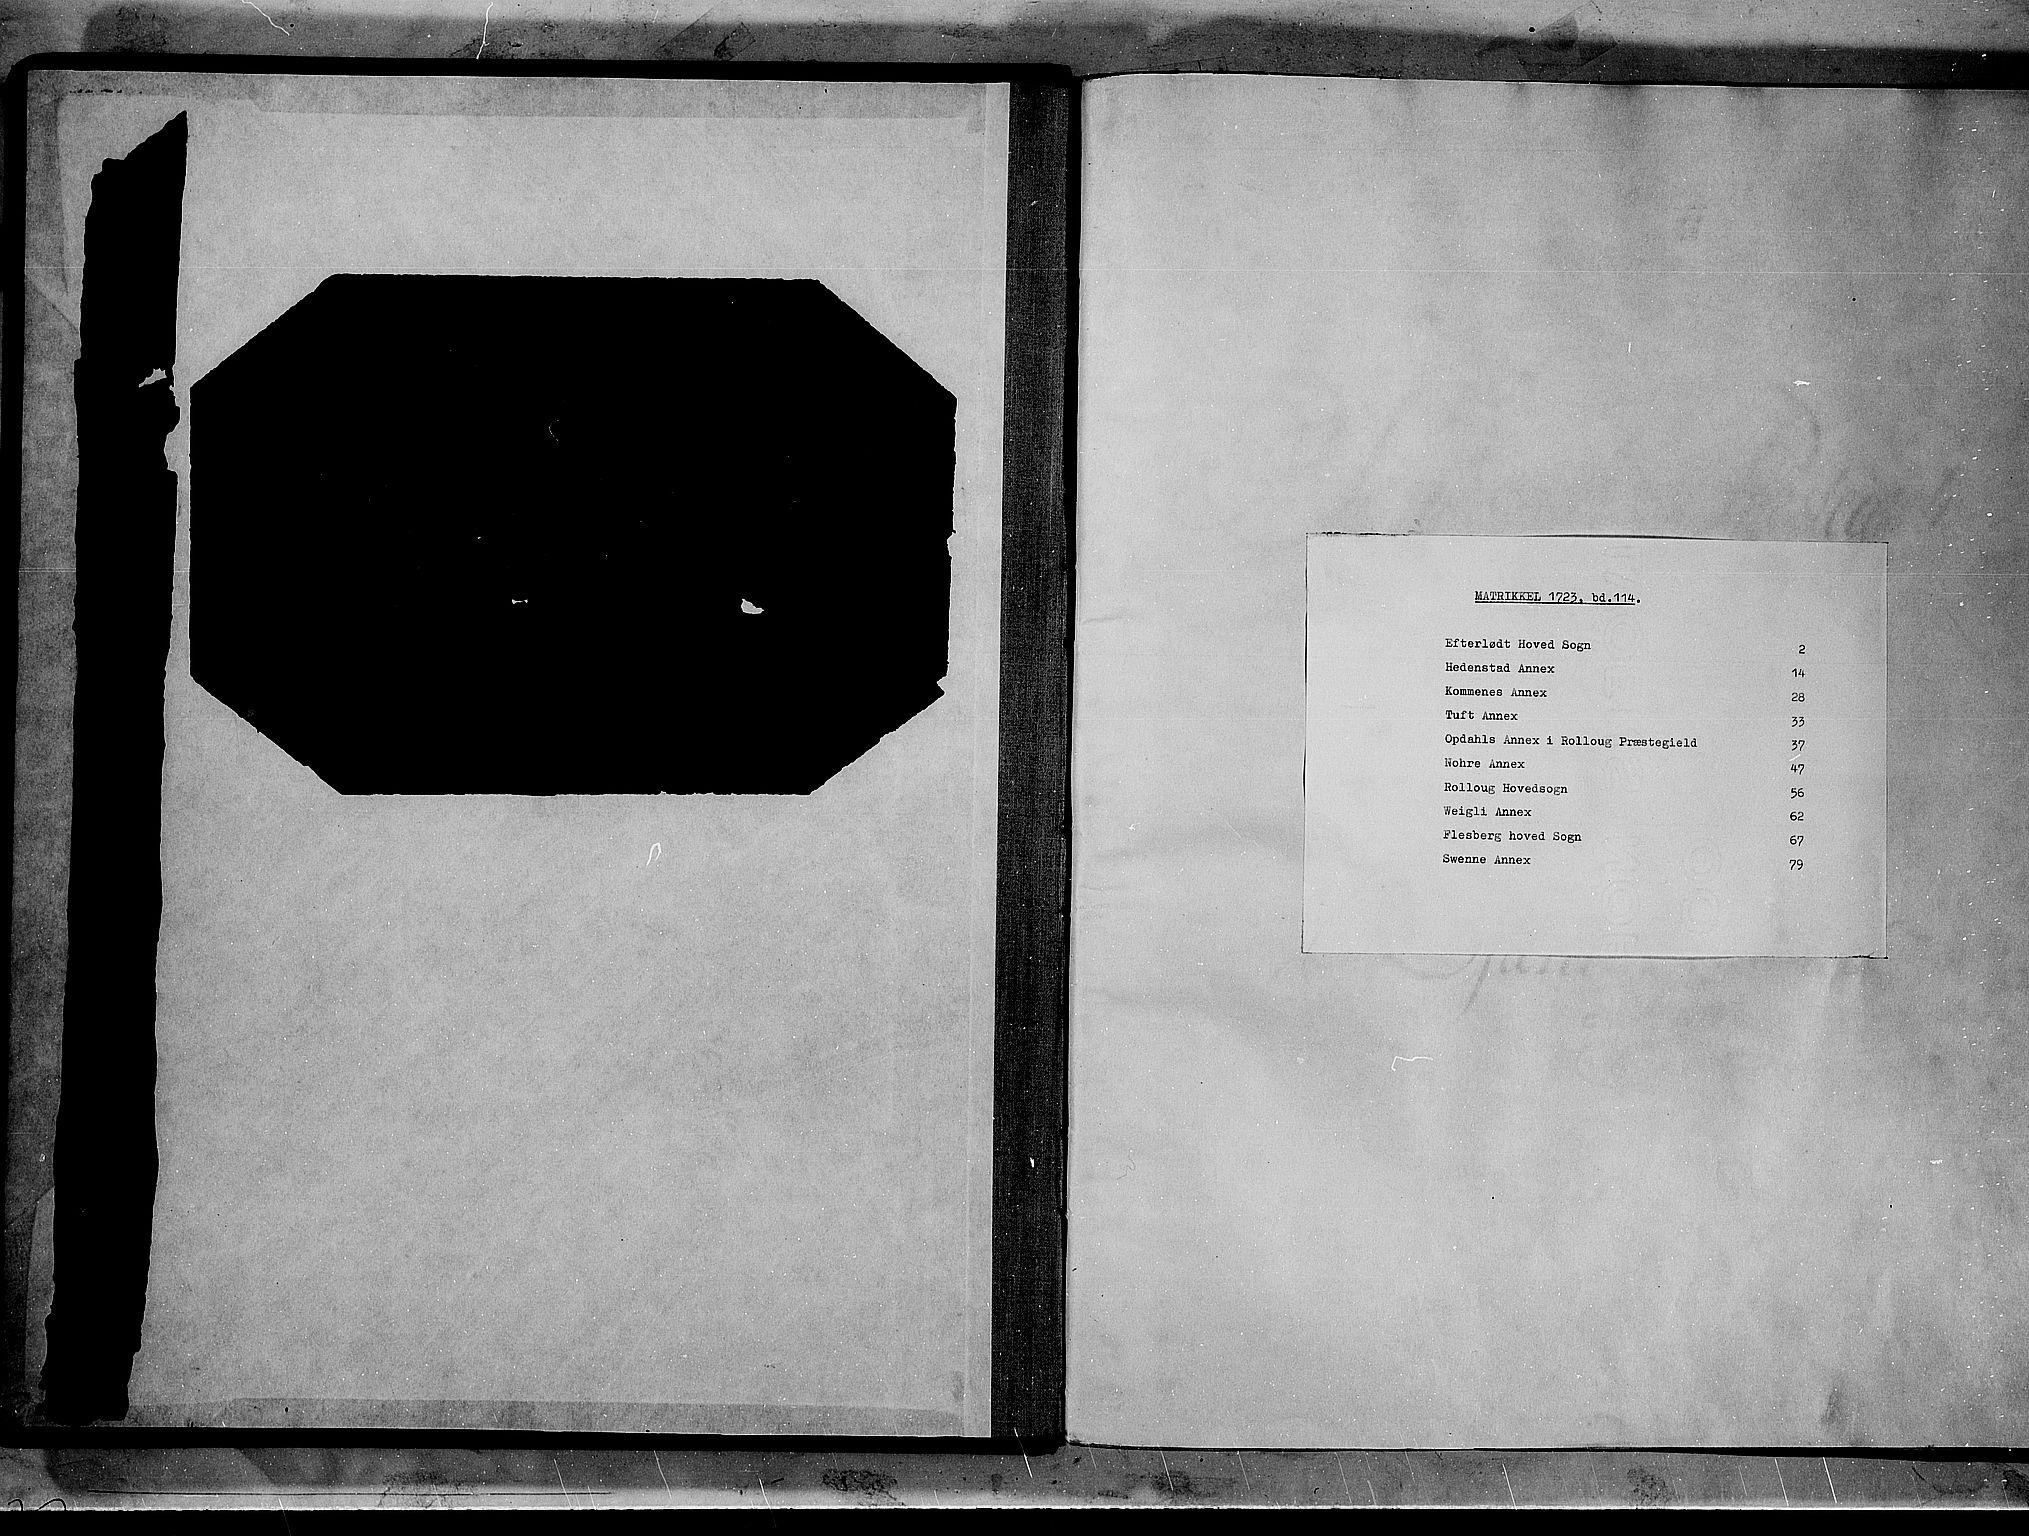 RA, Rentekammeret inntil 1814, Realistisk ordnet avdeling, N/Nb/Nbf/L0114: Numedal og Sandsvær matrikkelprotokoll, 1723, s. upaginert